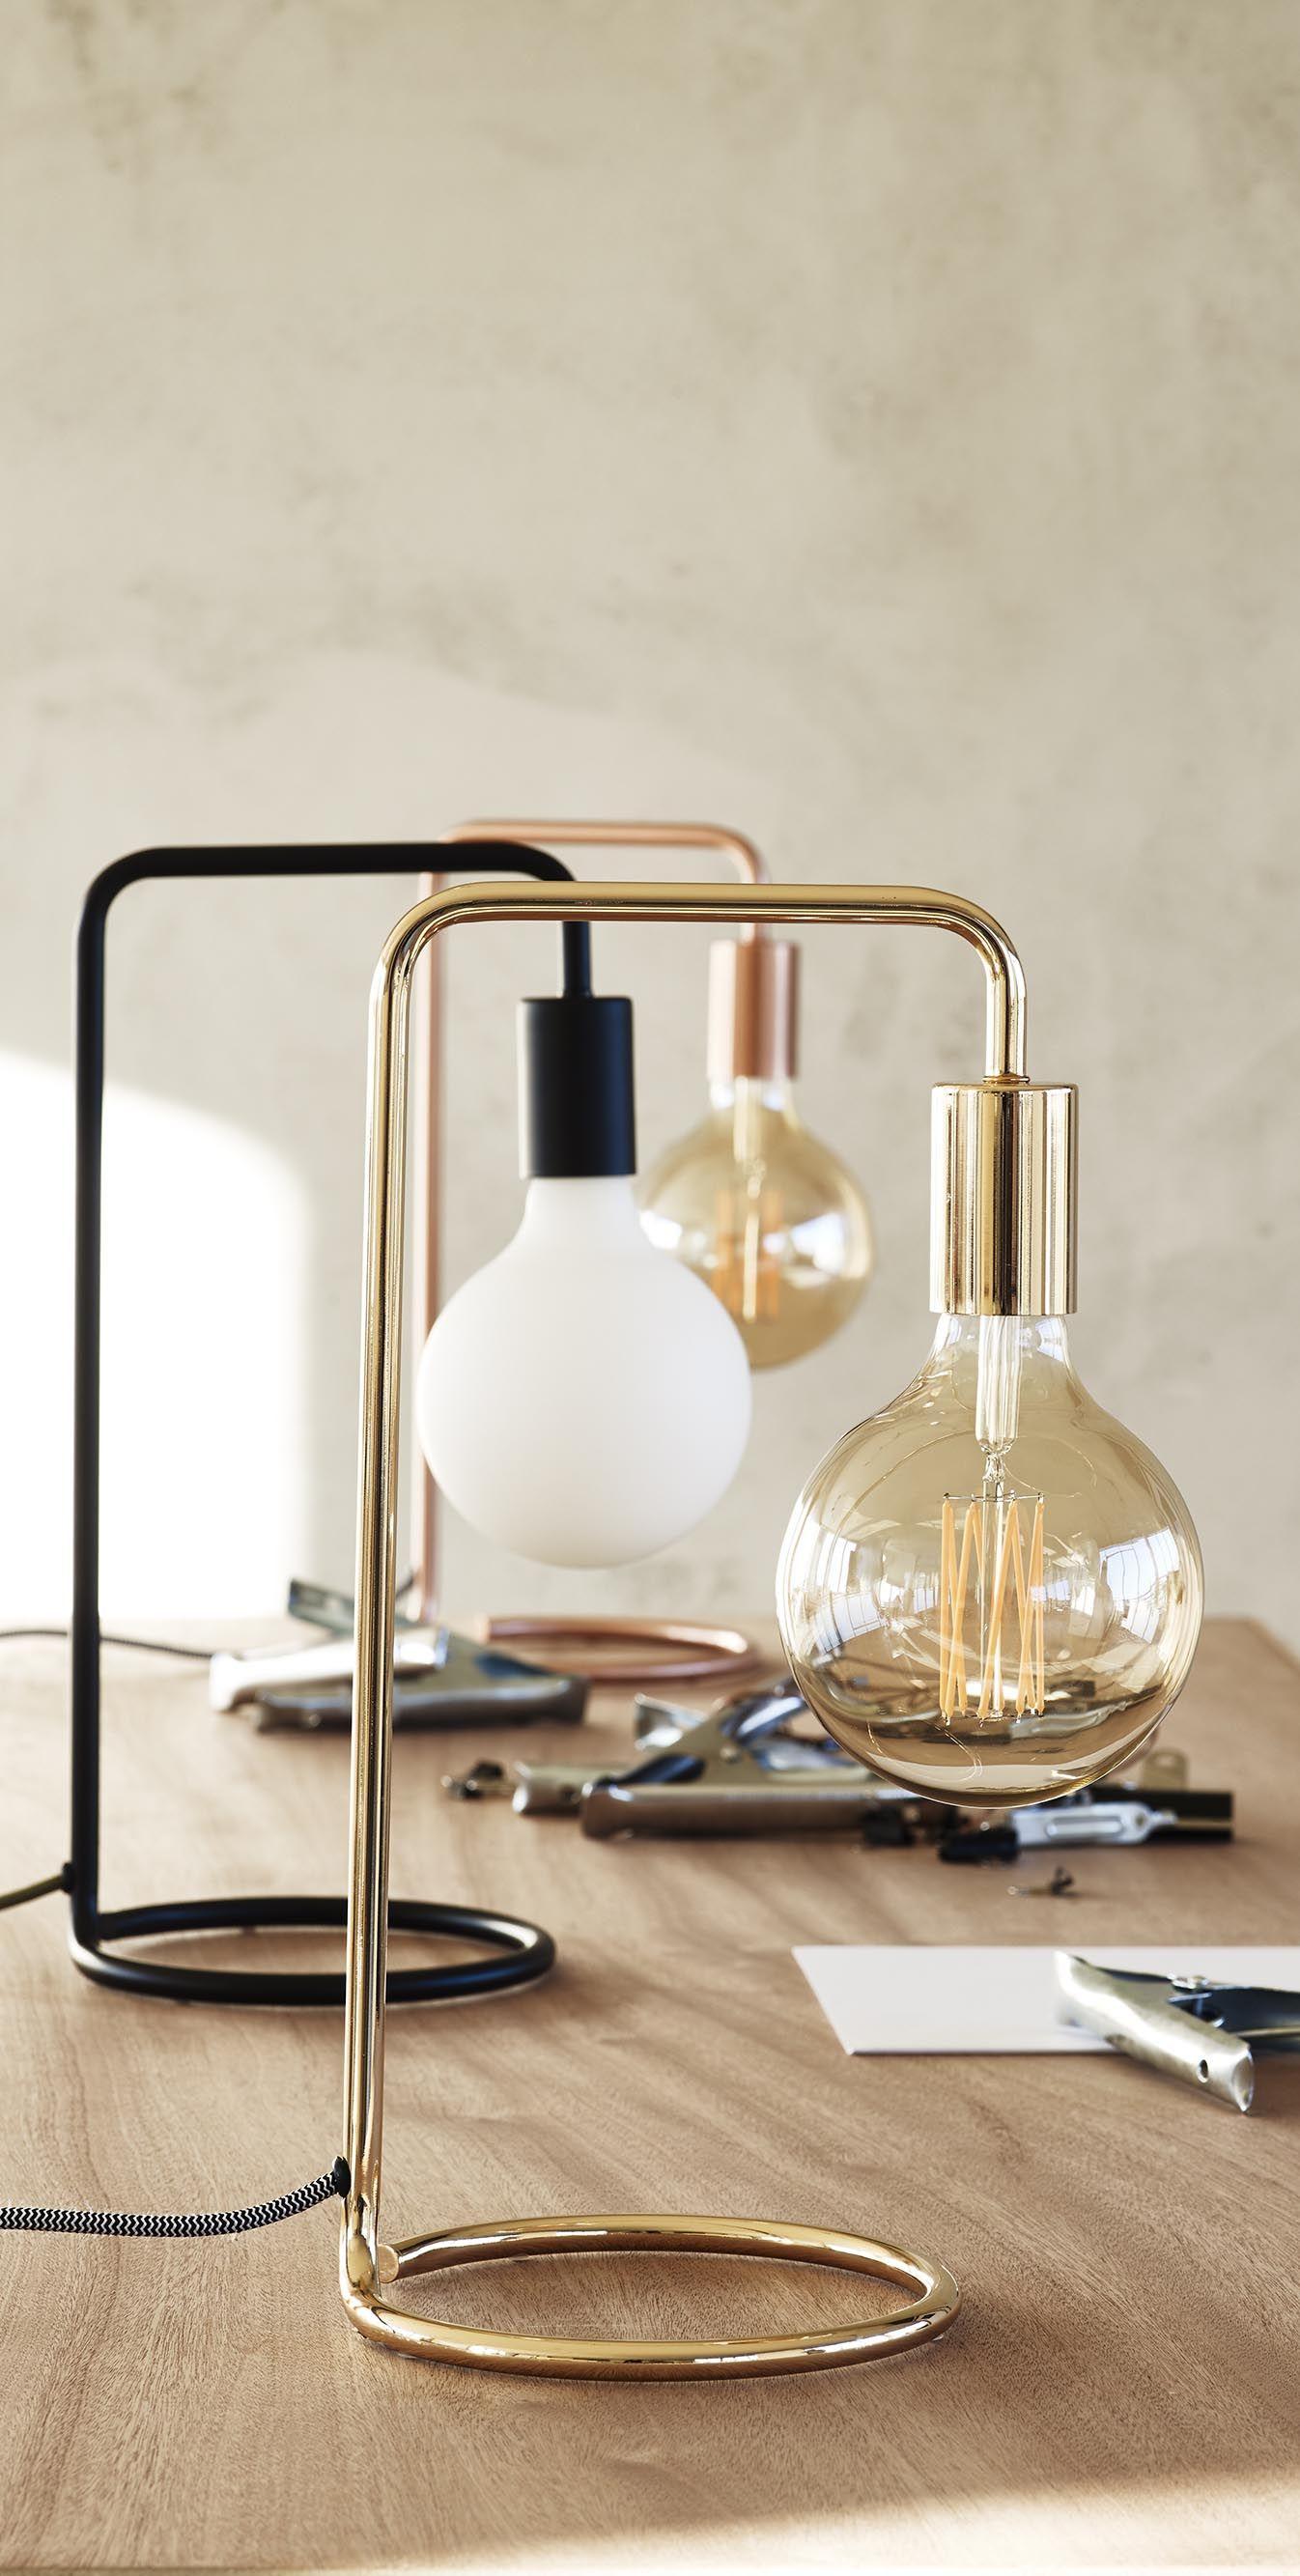 Celio Black Table Lamp | Black table lamps, Retro table ...